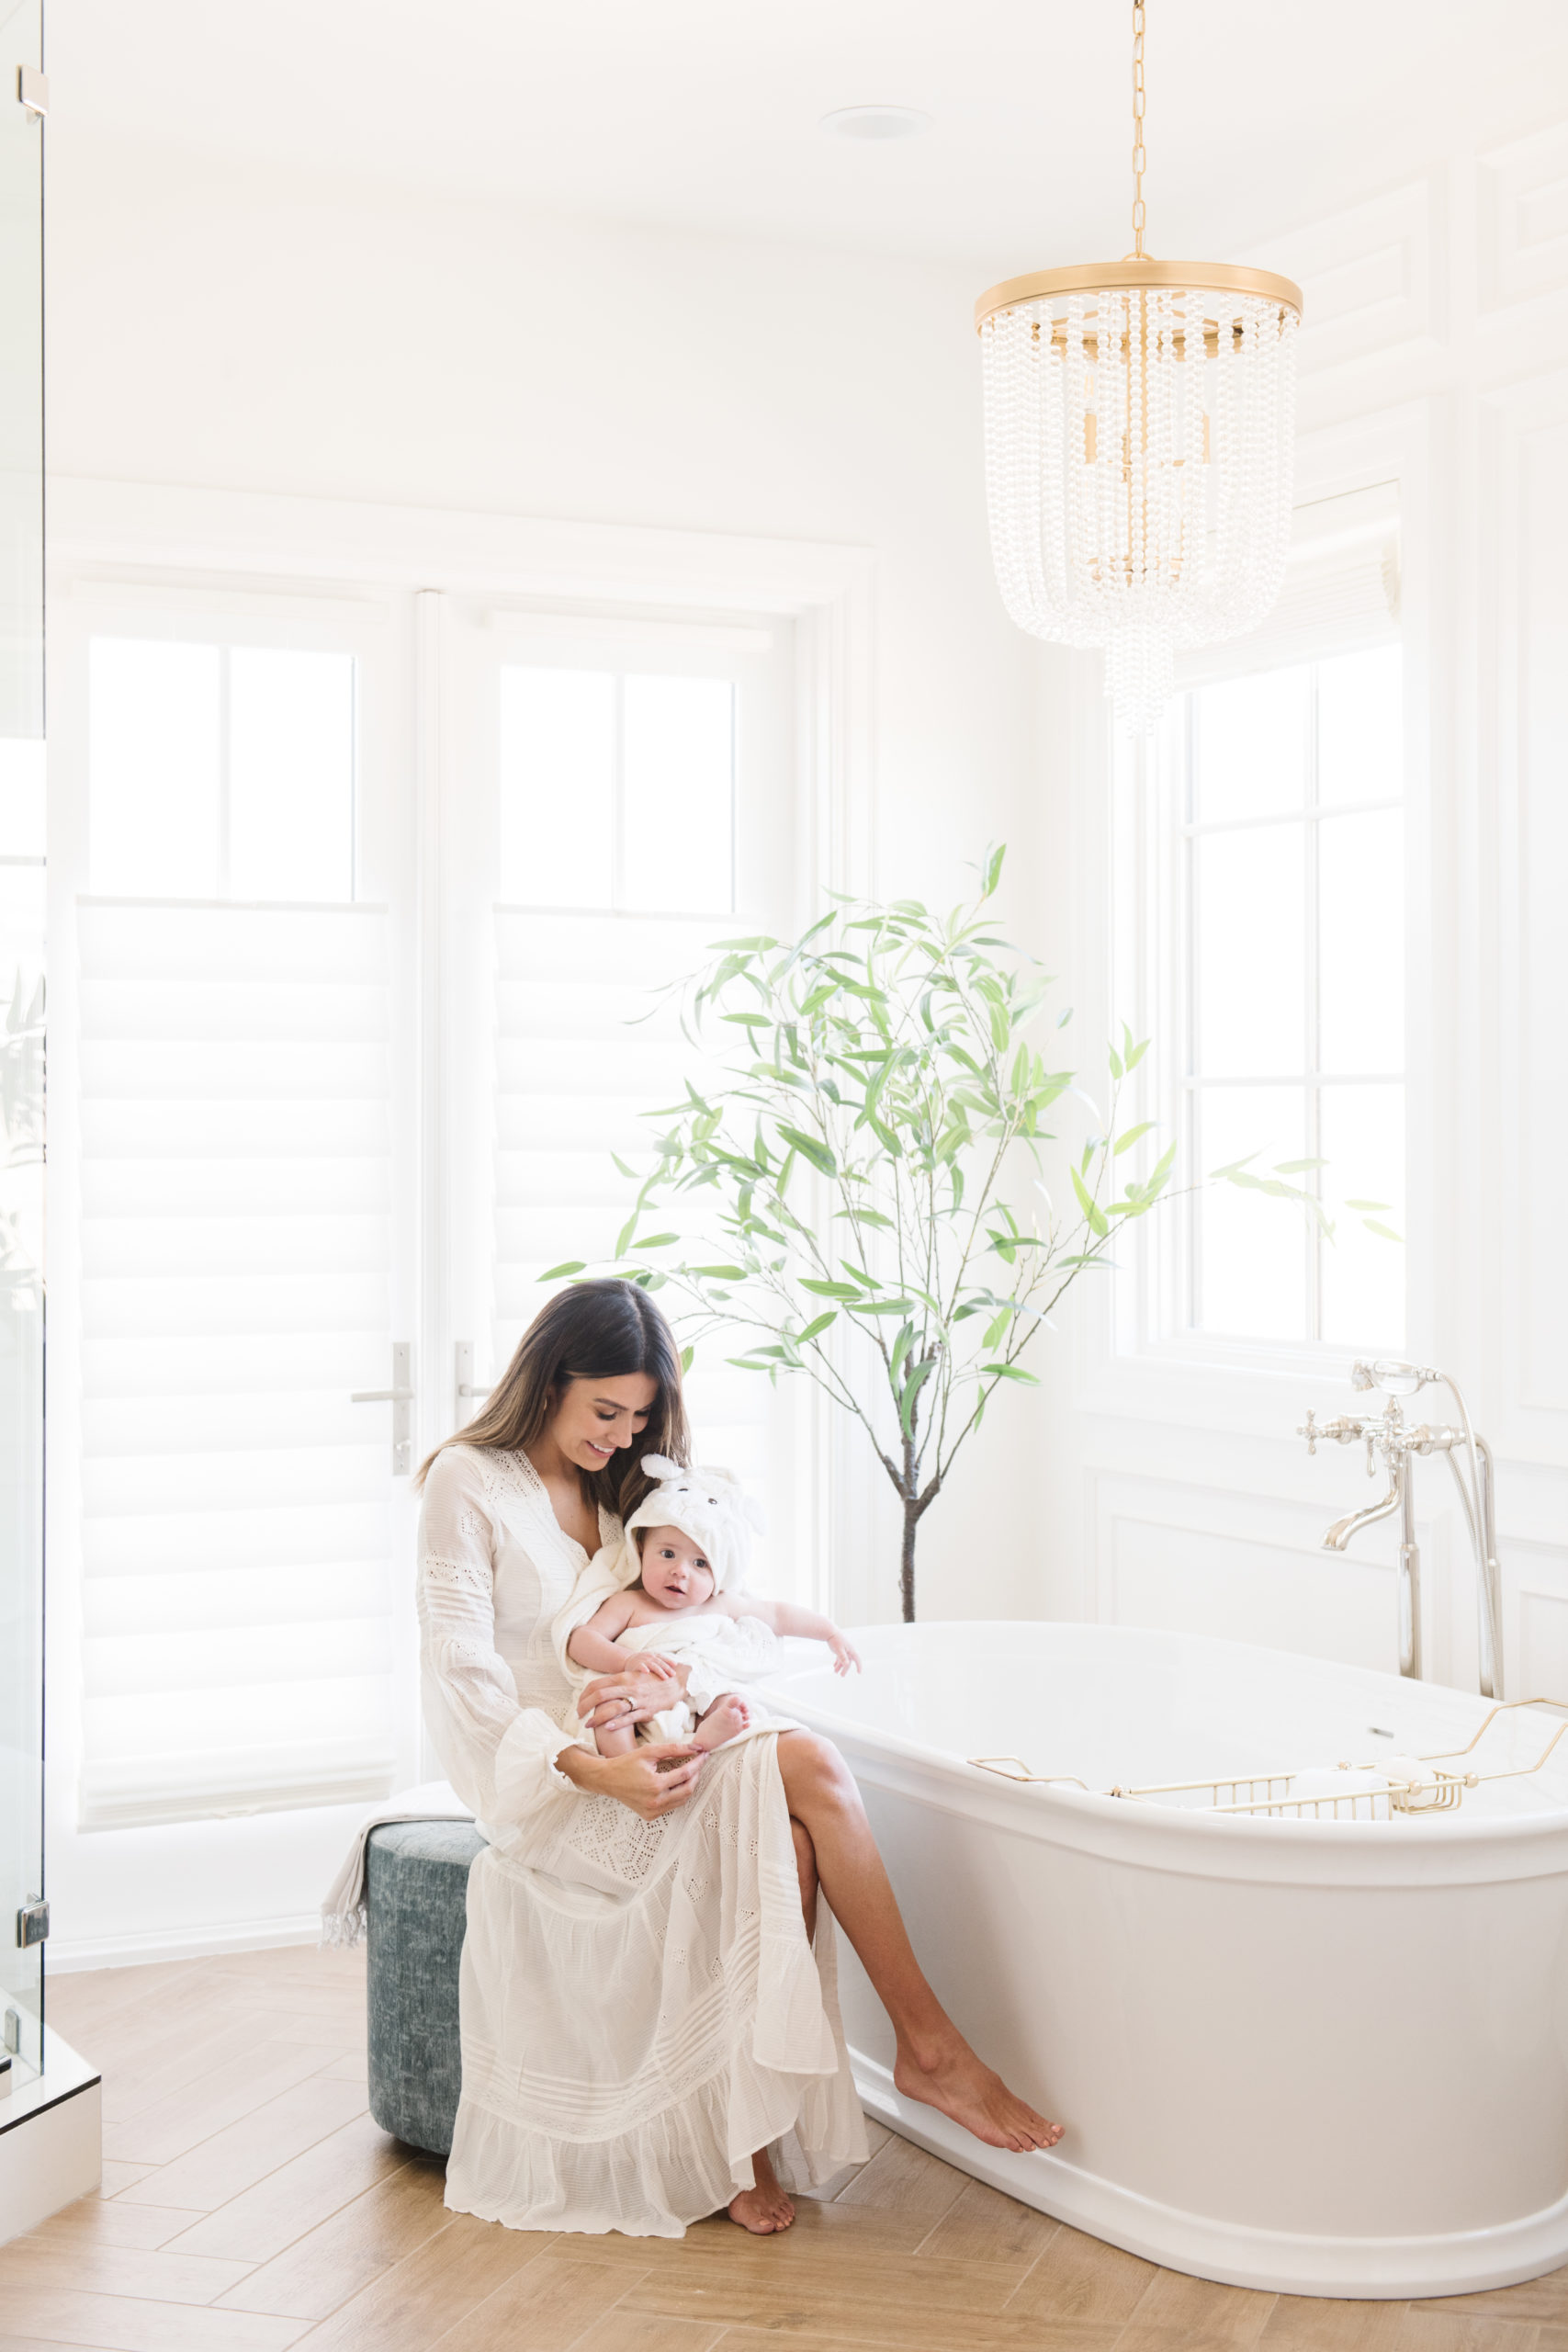 mom son bath time